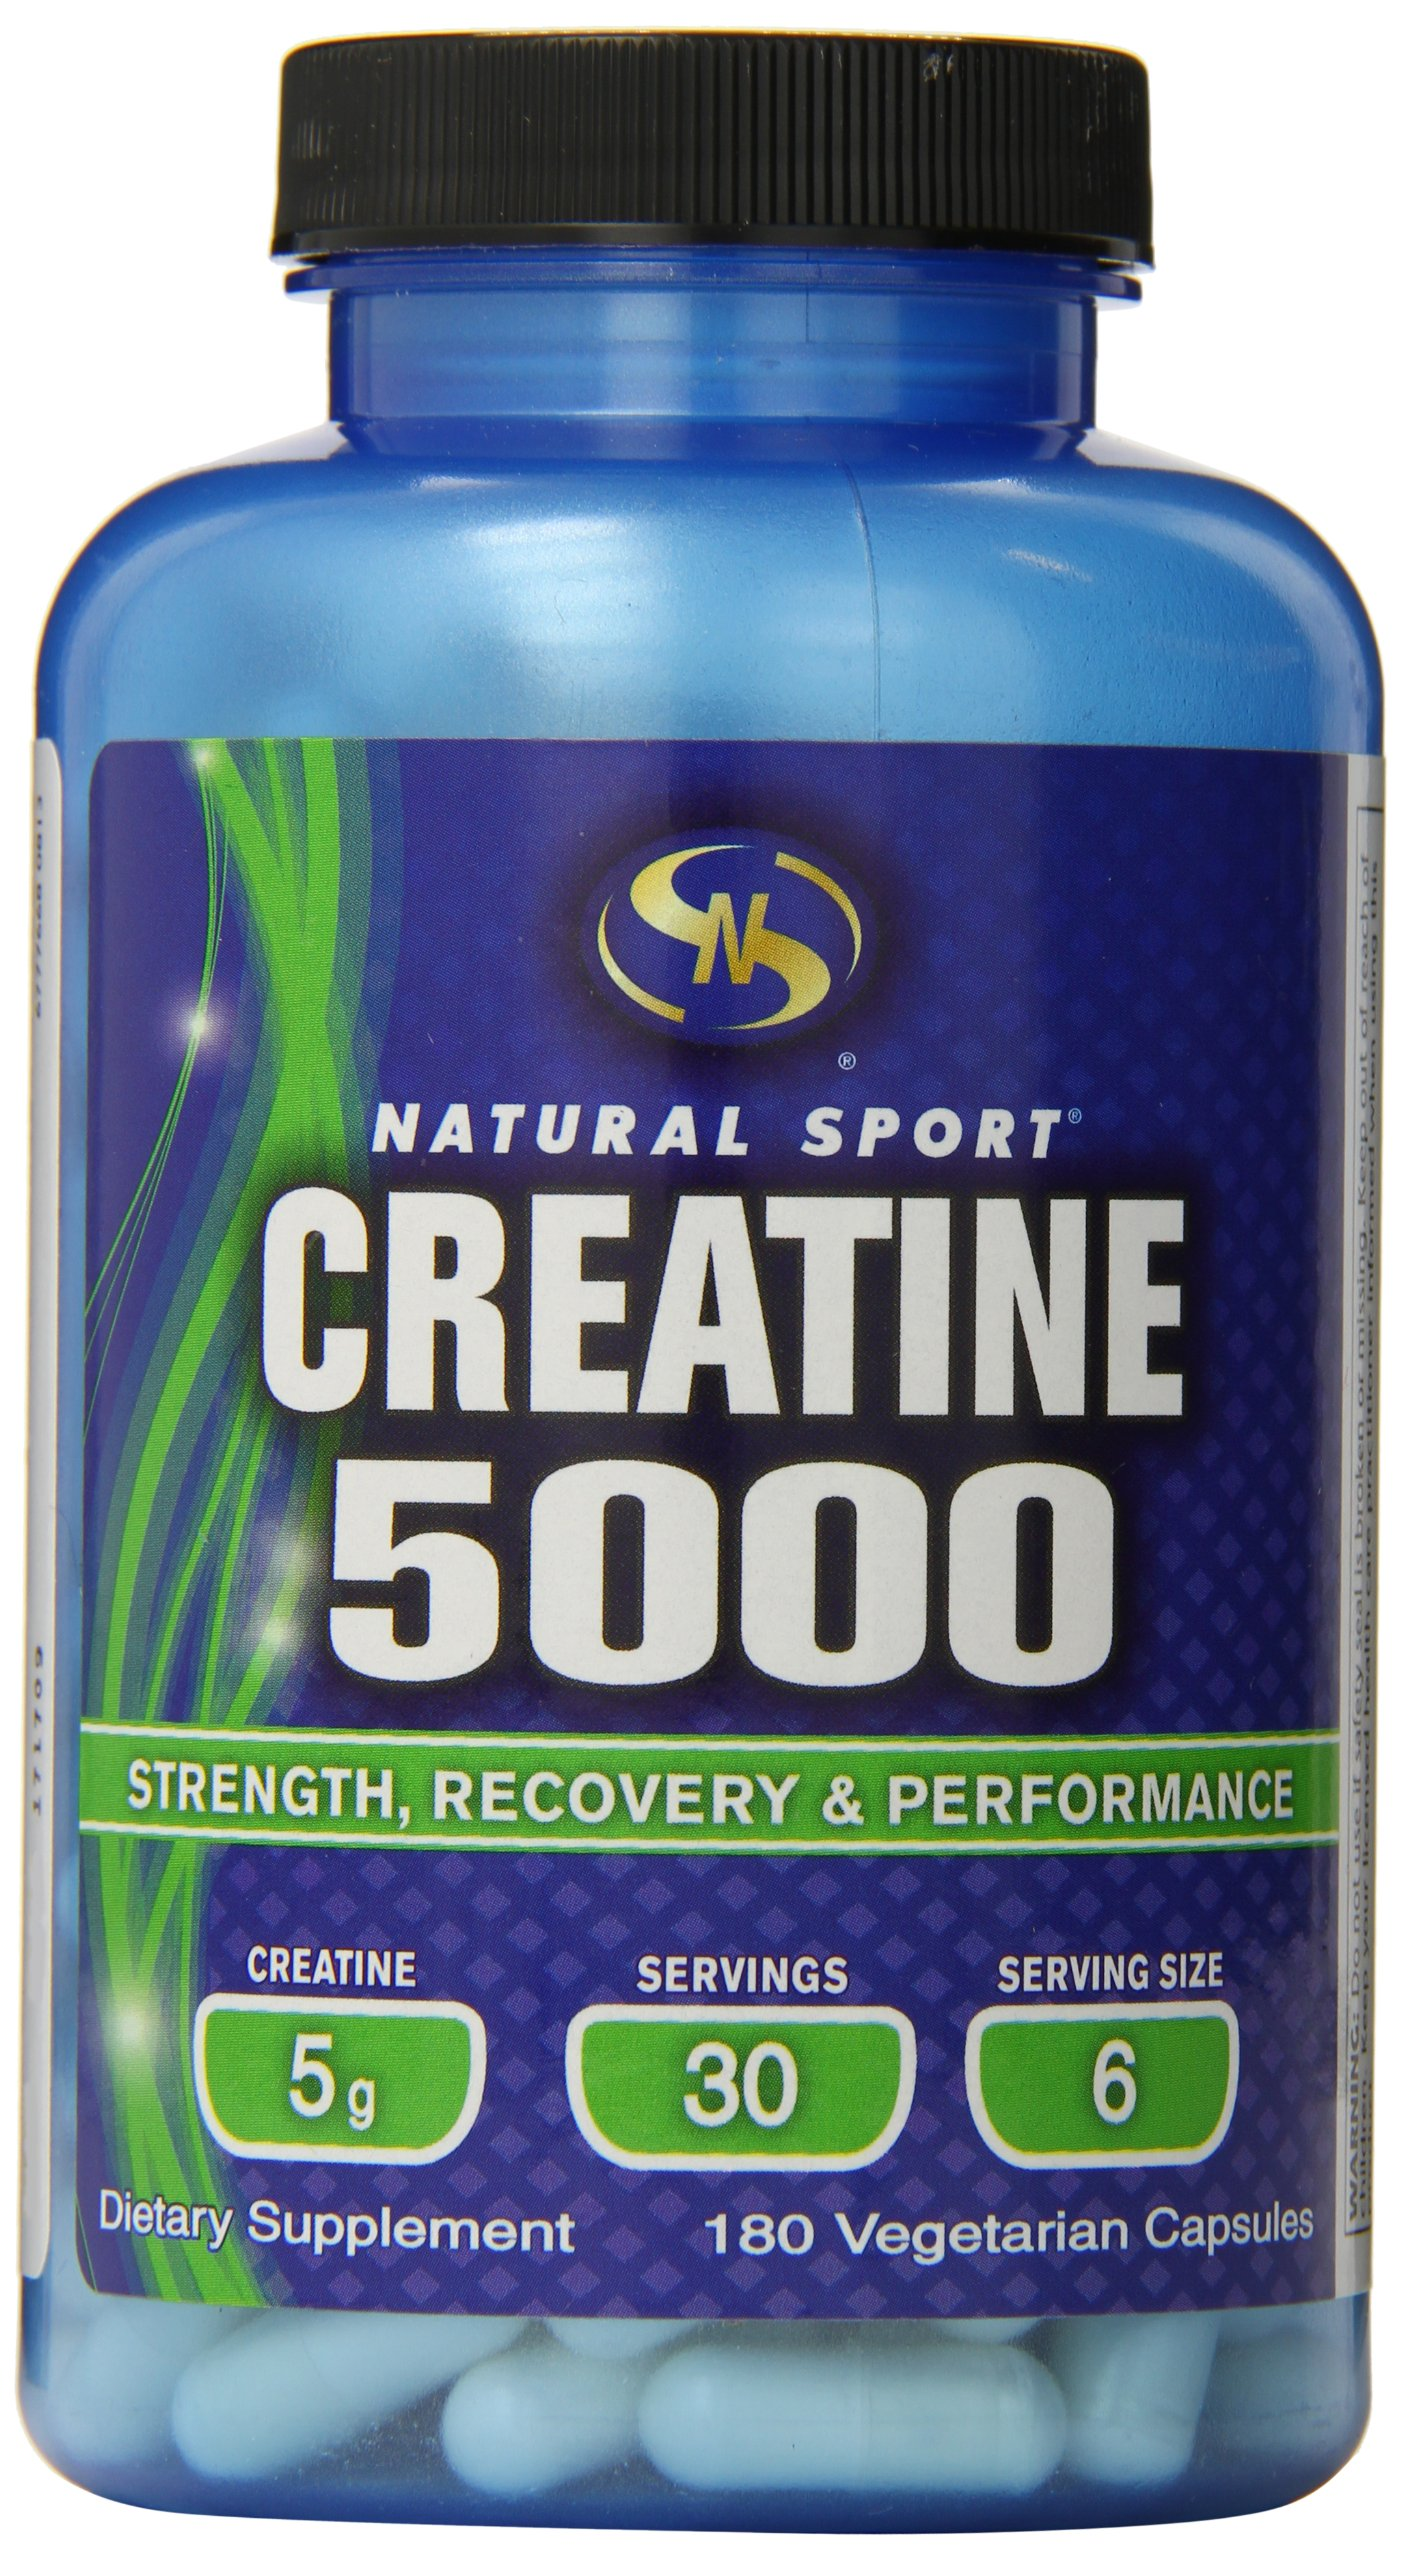 Natural Sport Creatine 5000 Vegetarian Capsules, 180 Count by Natural Sport